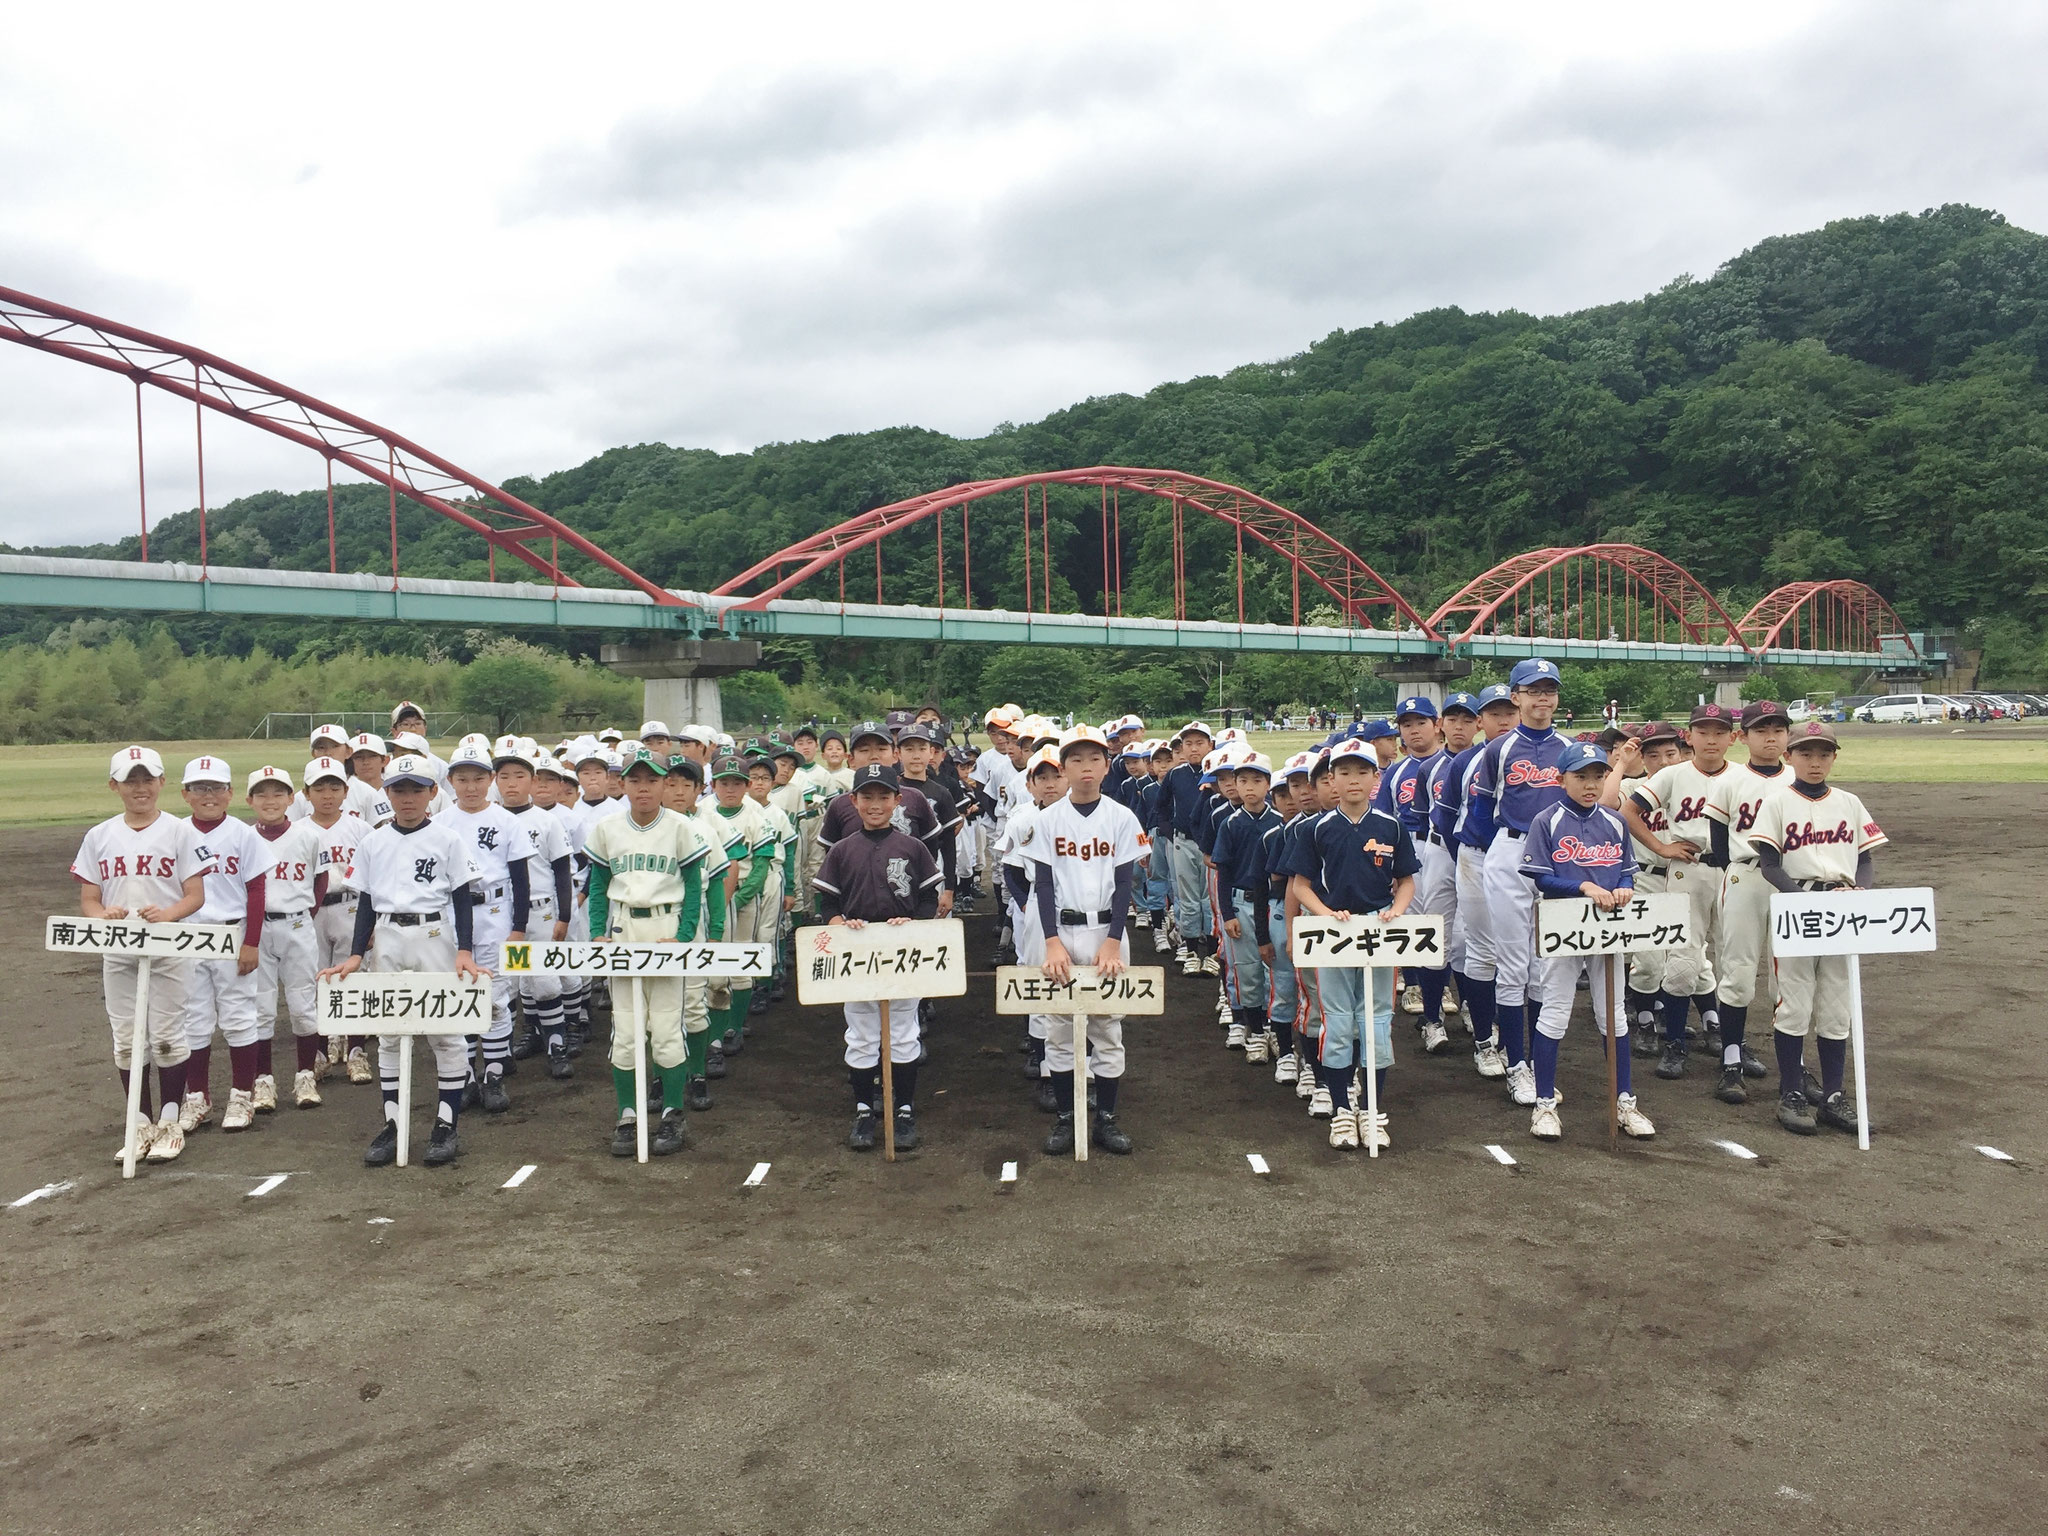 2017 J:COMジャビットカップ八王子市大会開会式 H29.5.14(日) 滝ガ原グラウンド